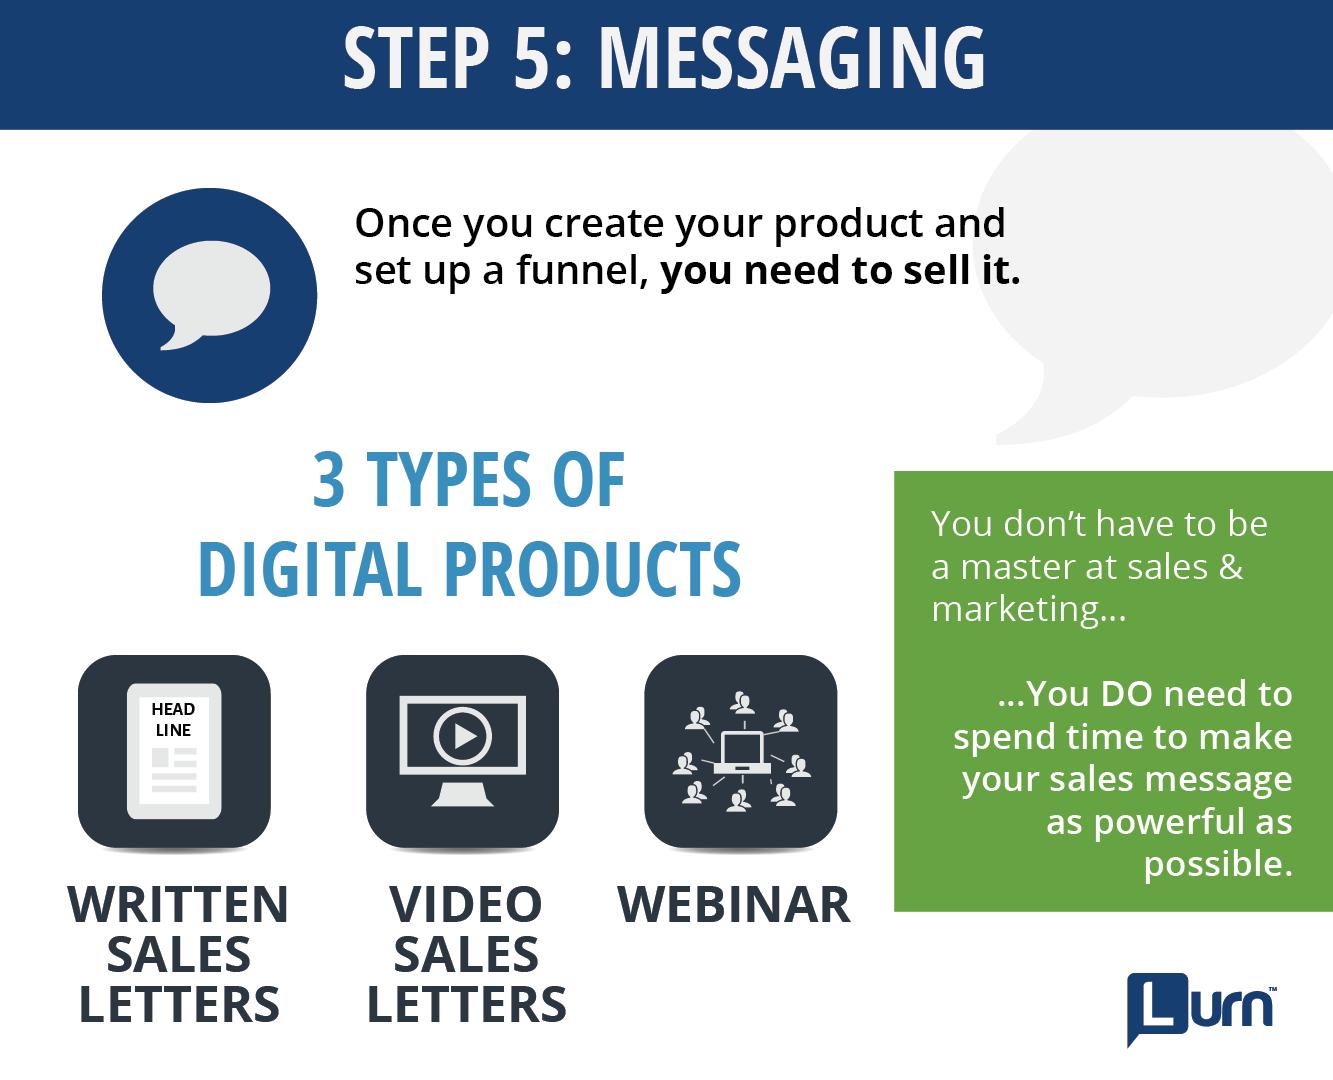 Step 5: Messaging To Convert